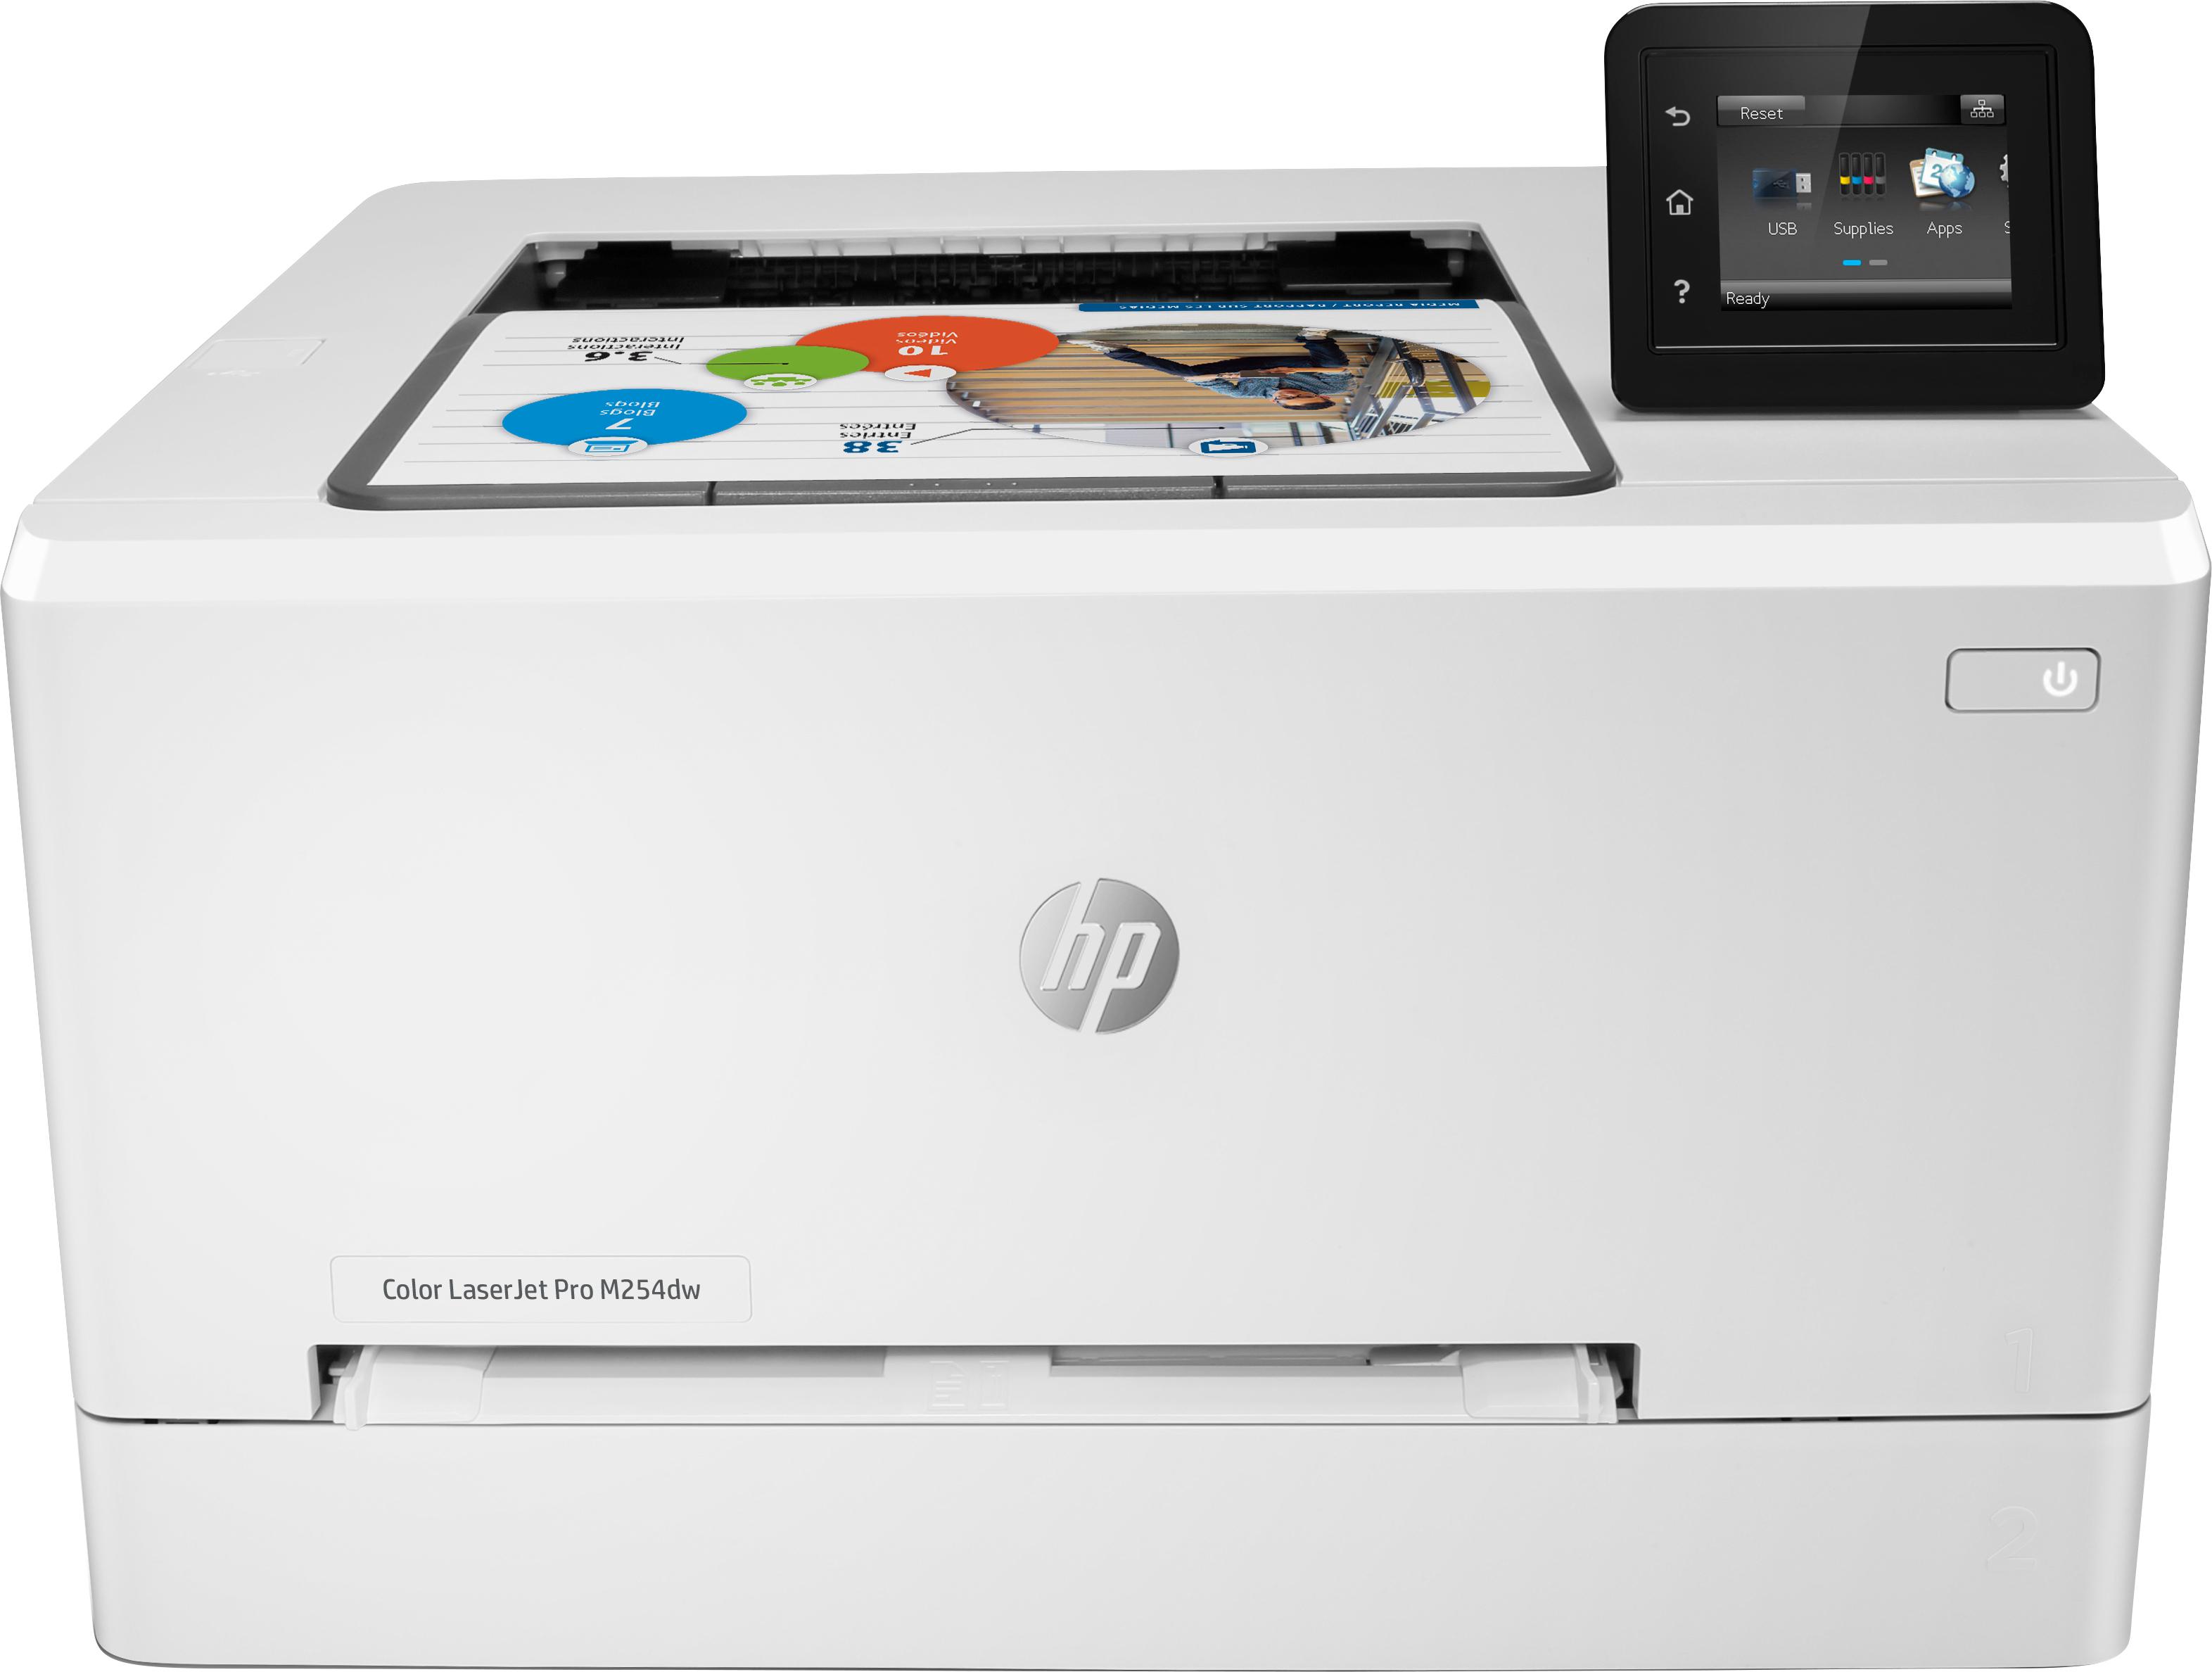 HP Color LaserJet Pro M254dw, Farblaser, A4